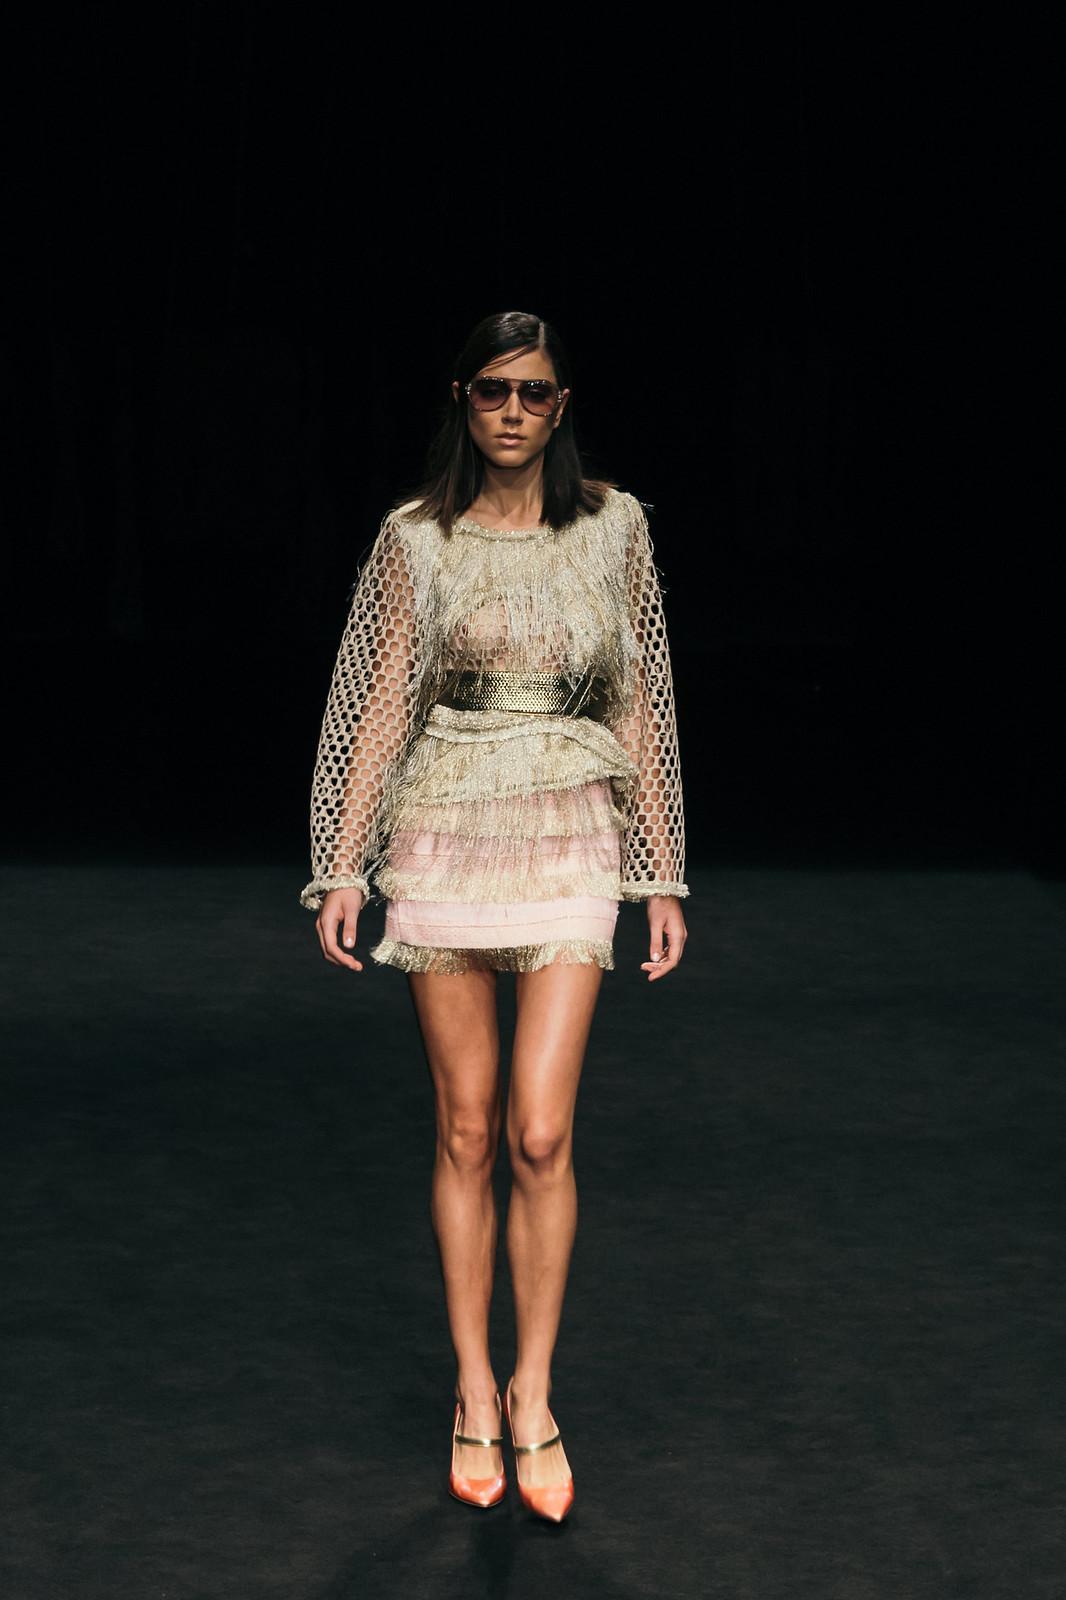 Jessie Chanes - Seams for a desire - 080 Bacelona Fashion #080bcnfasion -17